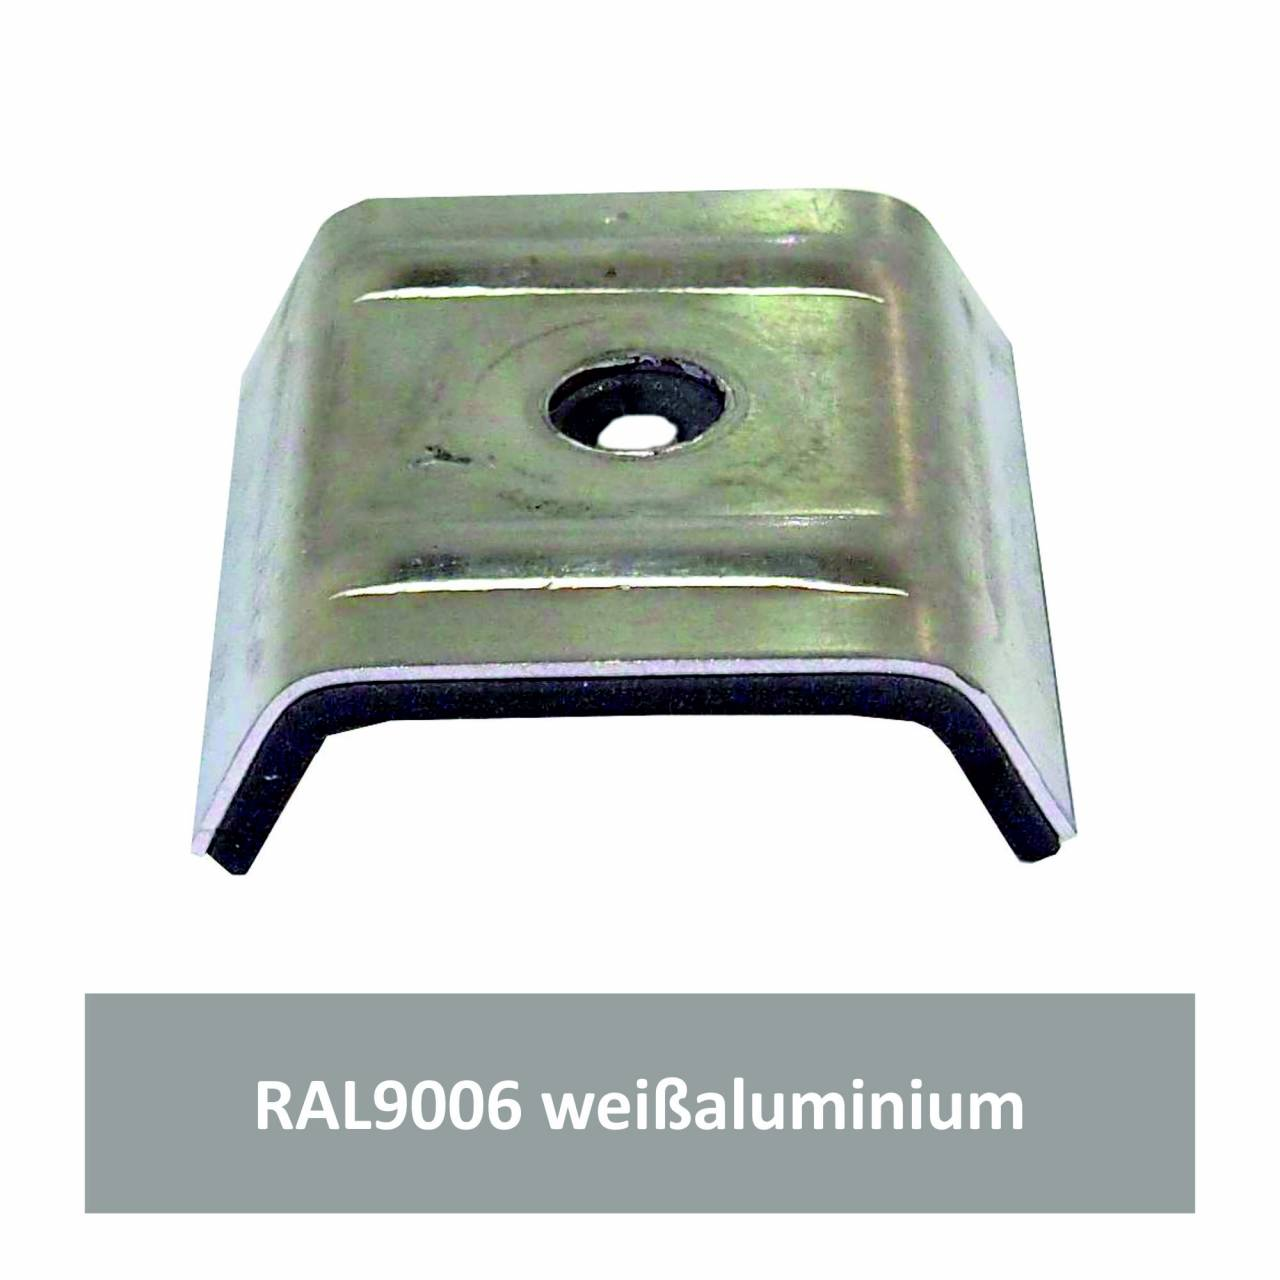 Kalotten für N1000T, Alu RAL9006 weißaluminium / Pck a 100 Stück